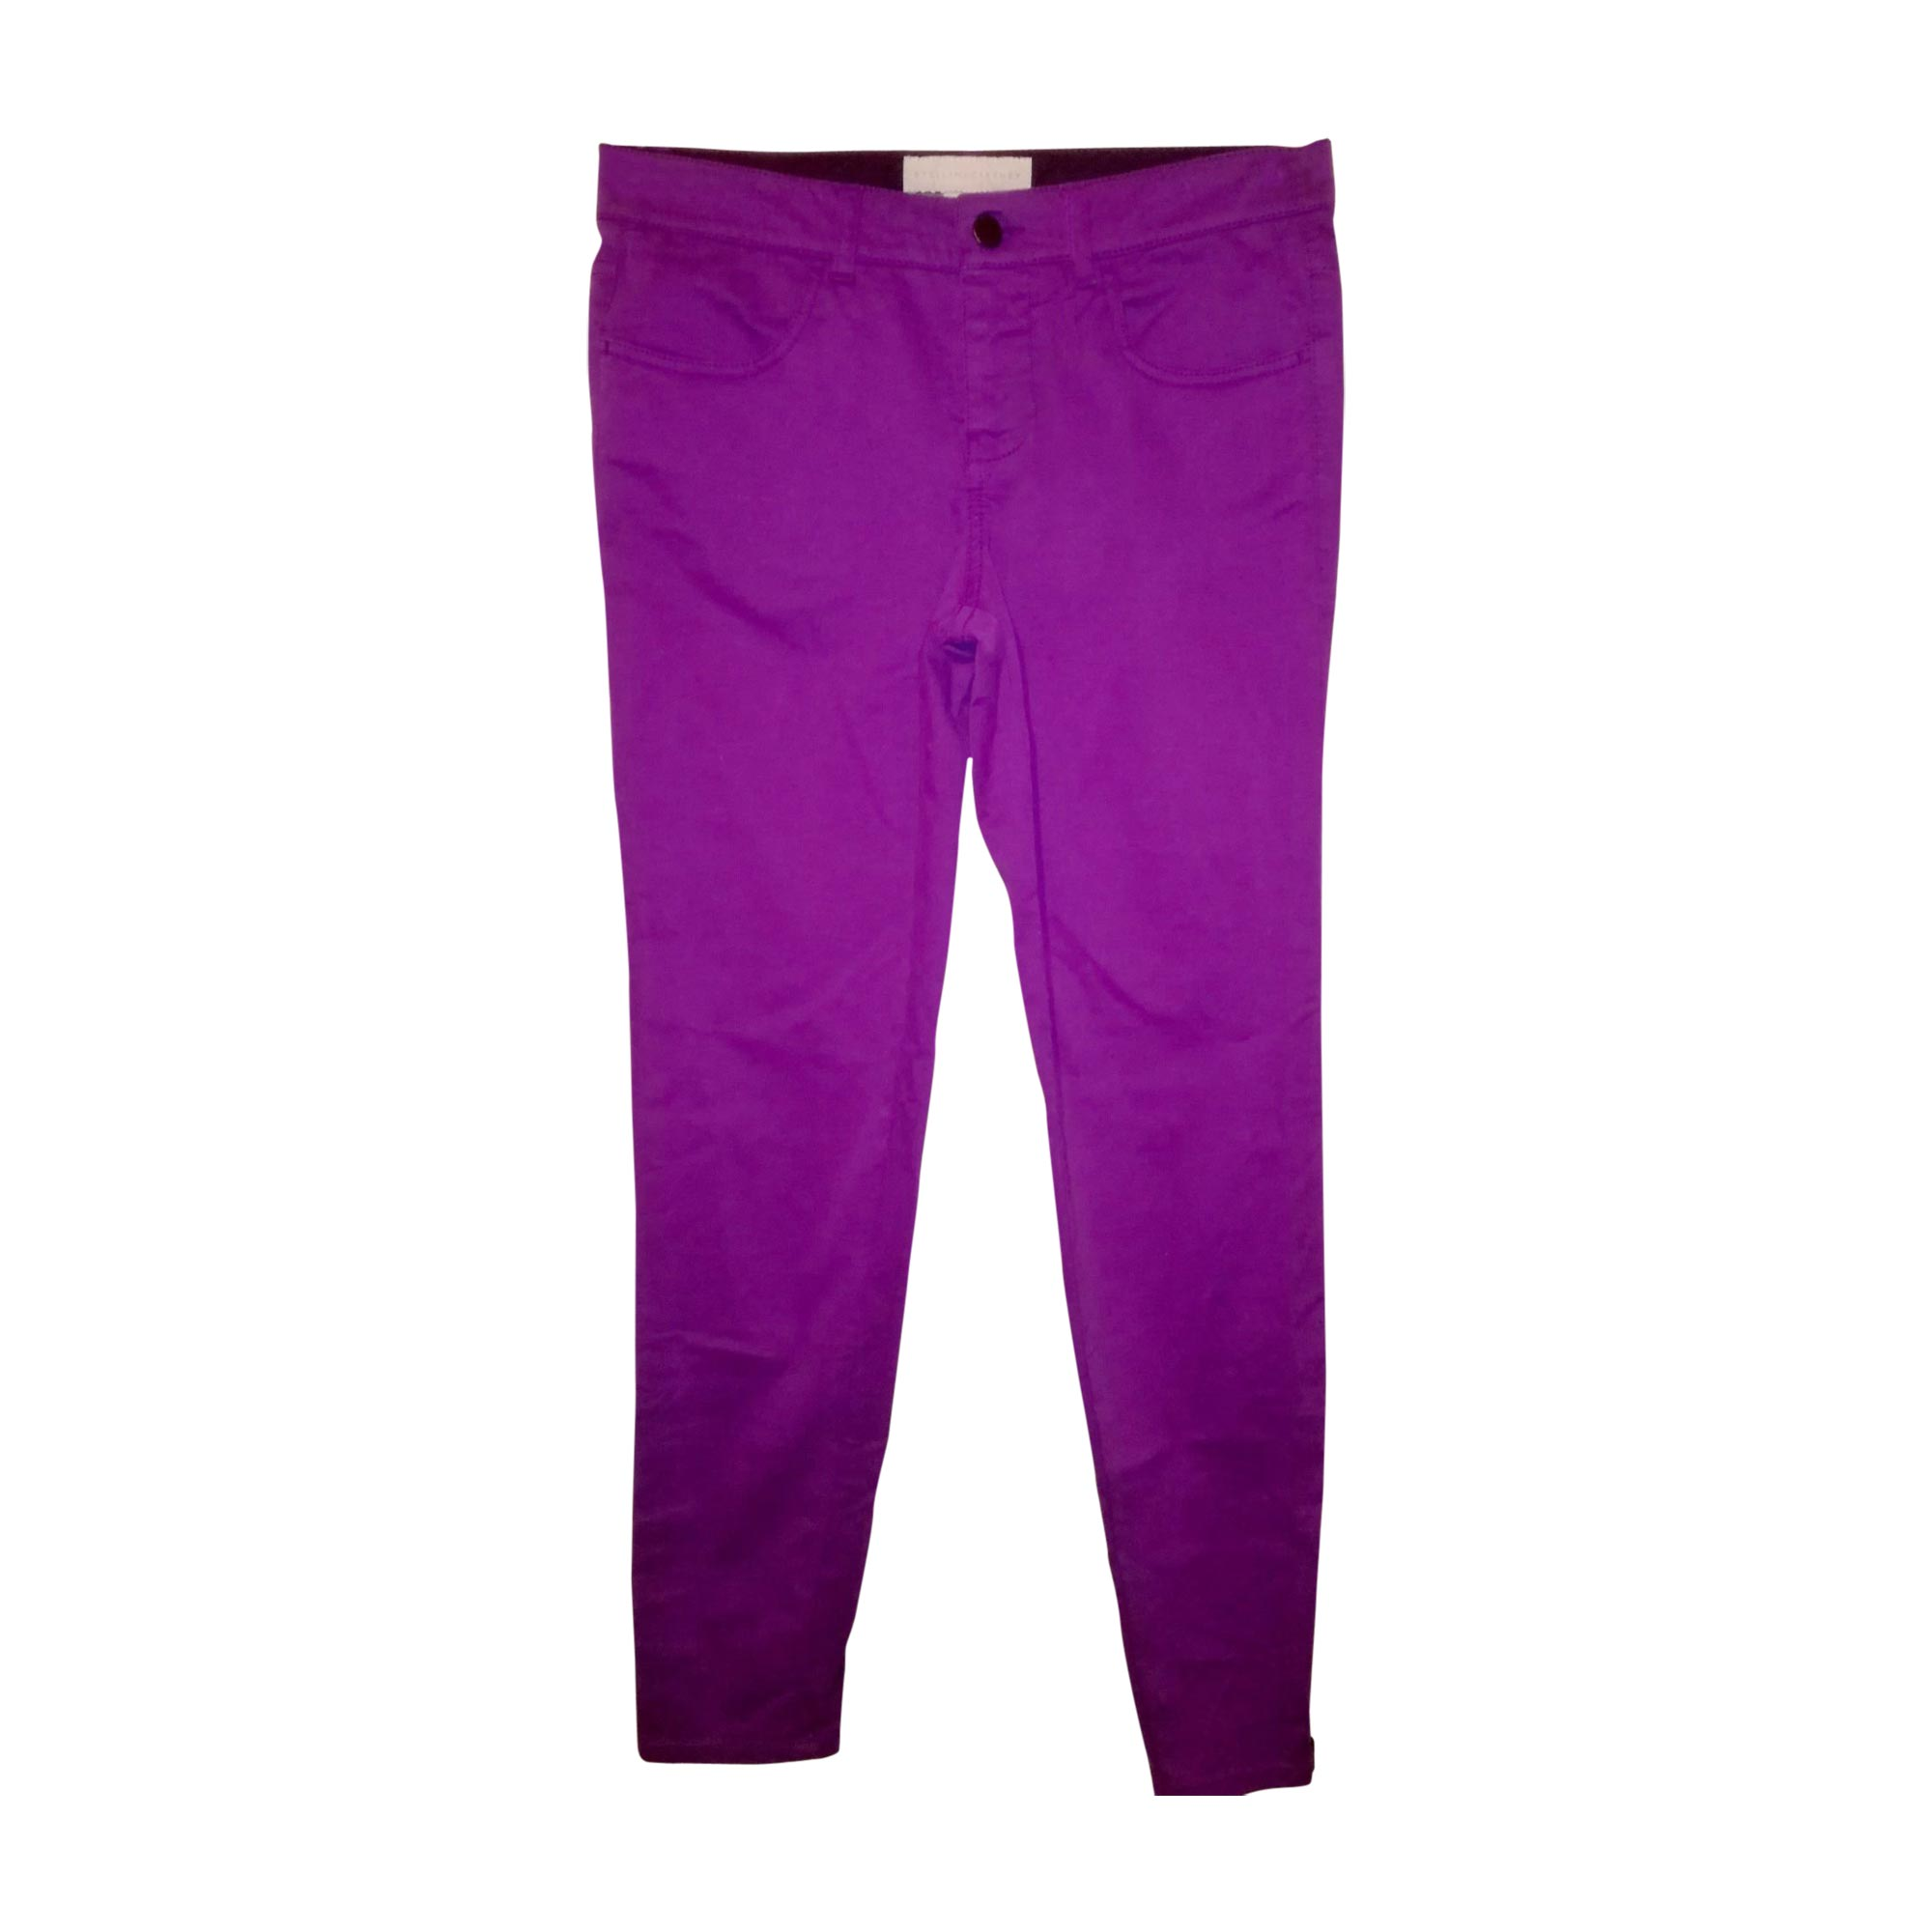 Jeans slim STELLA MCCARTNEY Violet, mauve, lavande